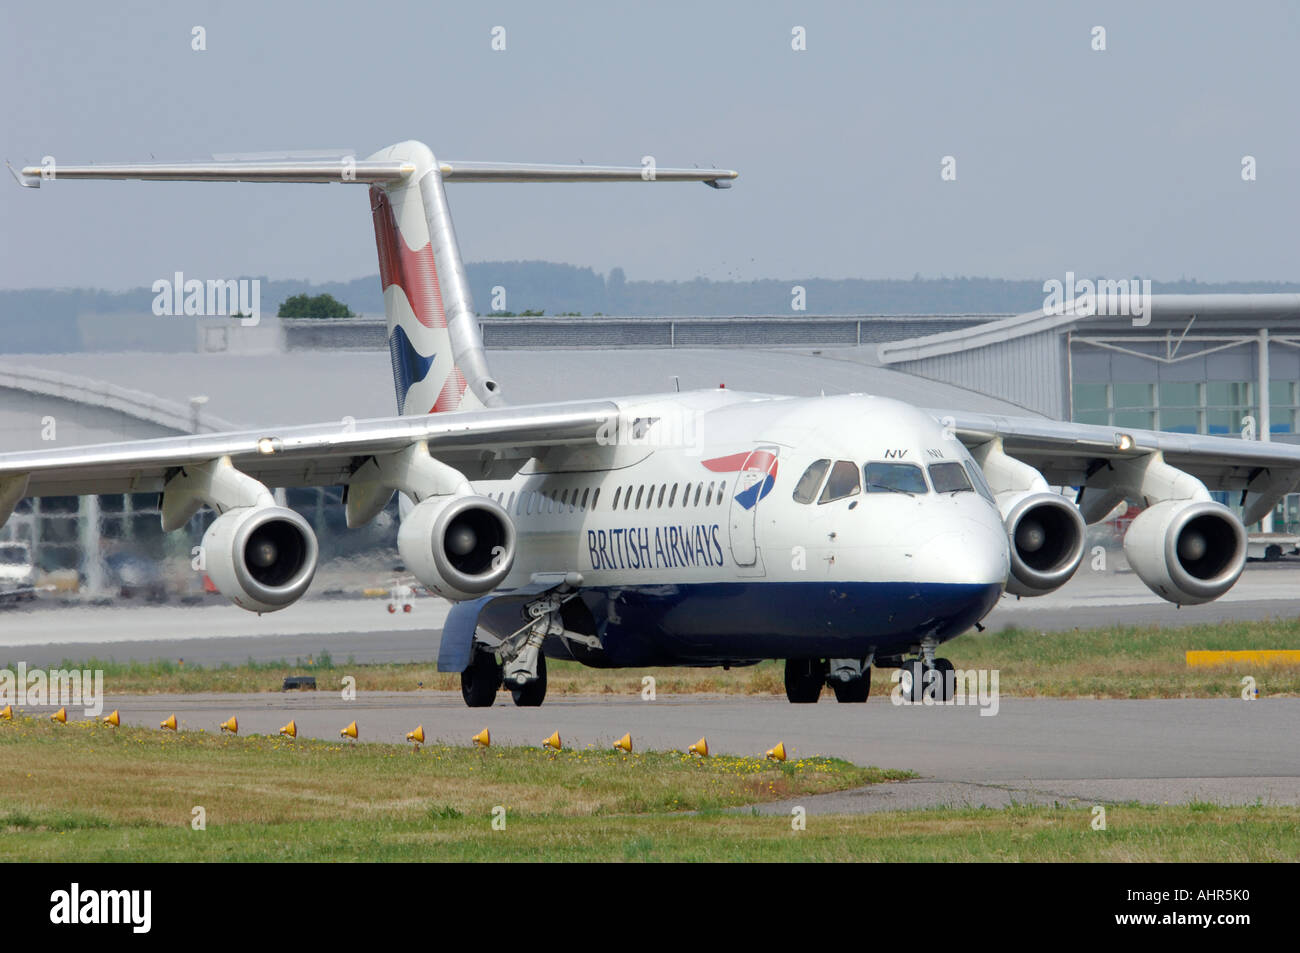 BEA 146-300 British Airways Connect Passenger Jet Airliner.   XAV 1247-301 - Stock Image